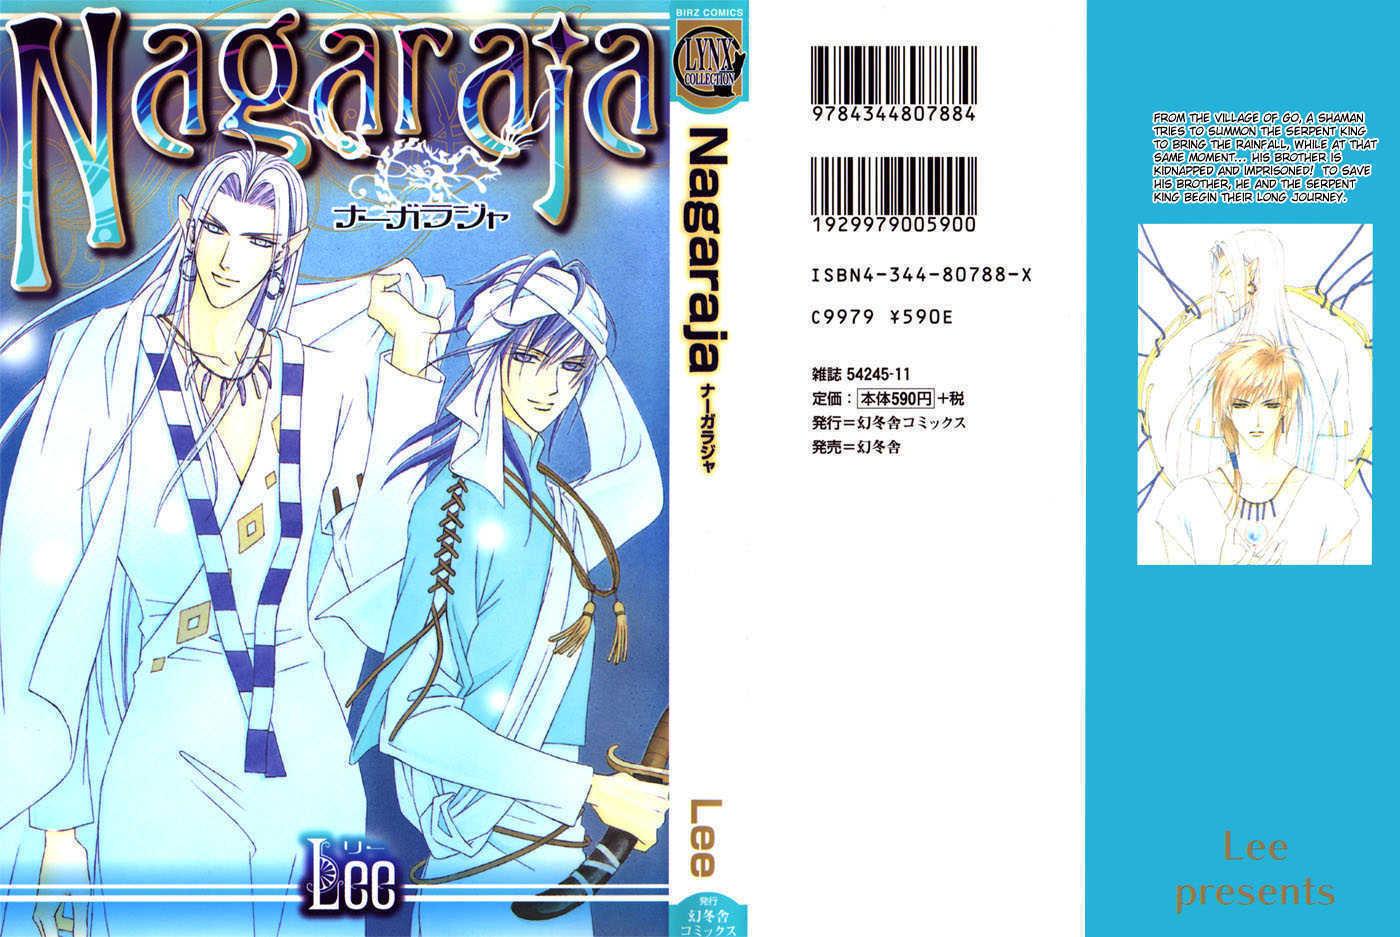 Nagaraja 6 Page 3